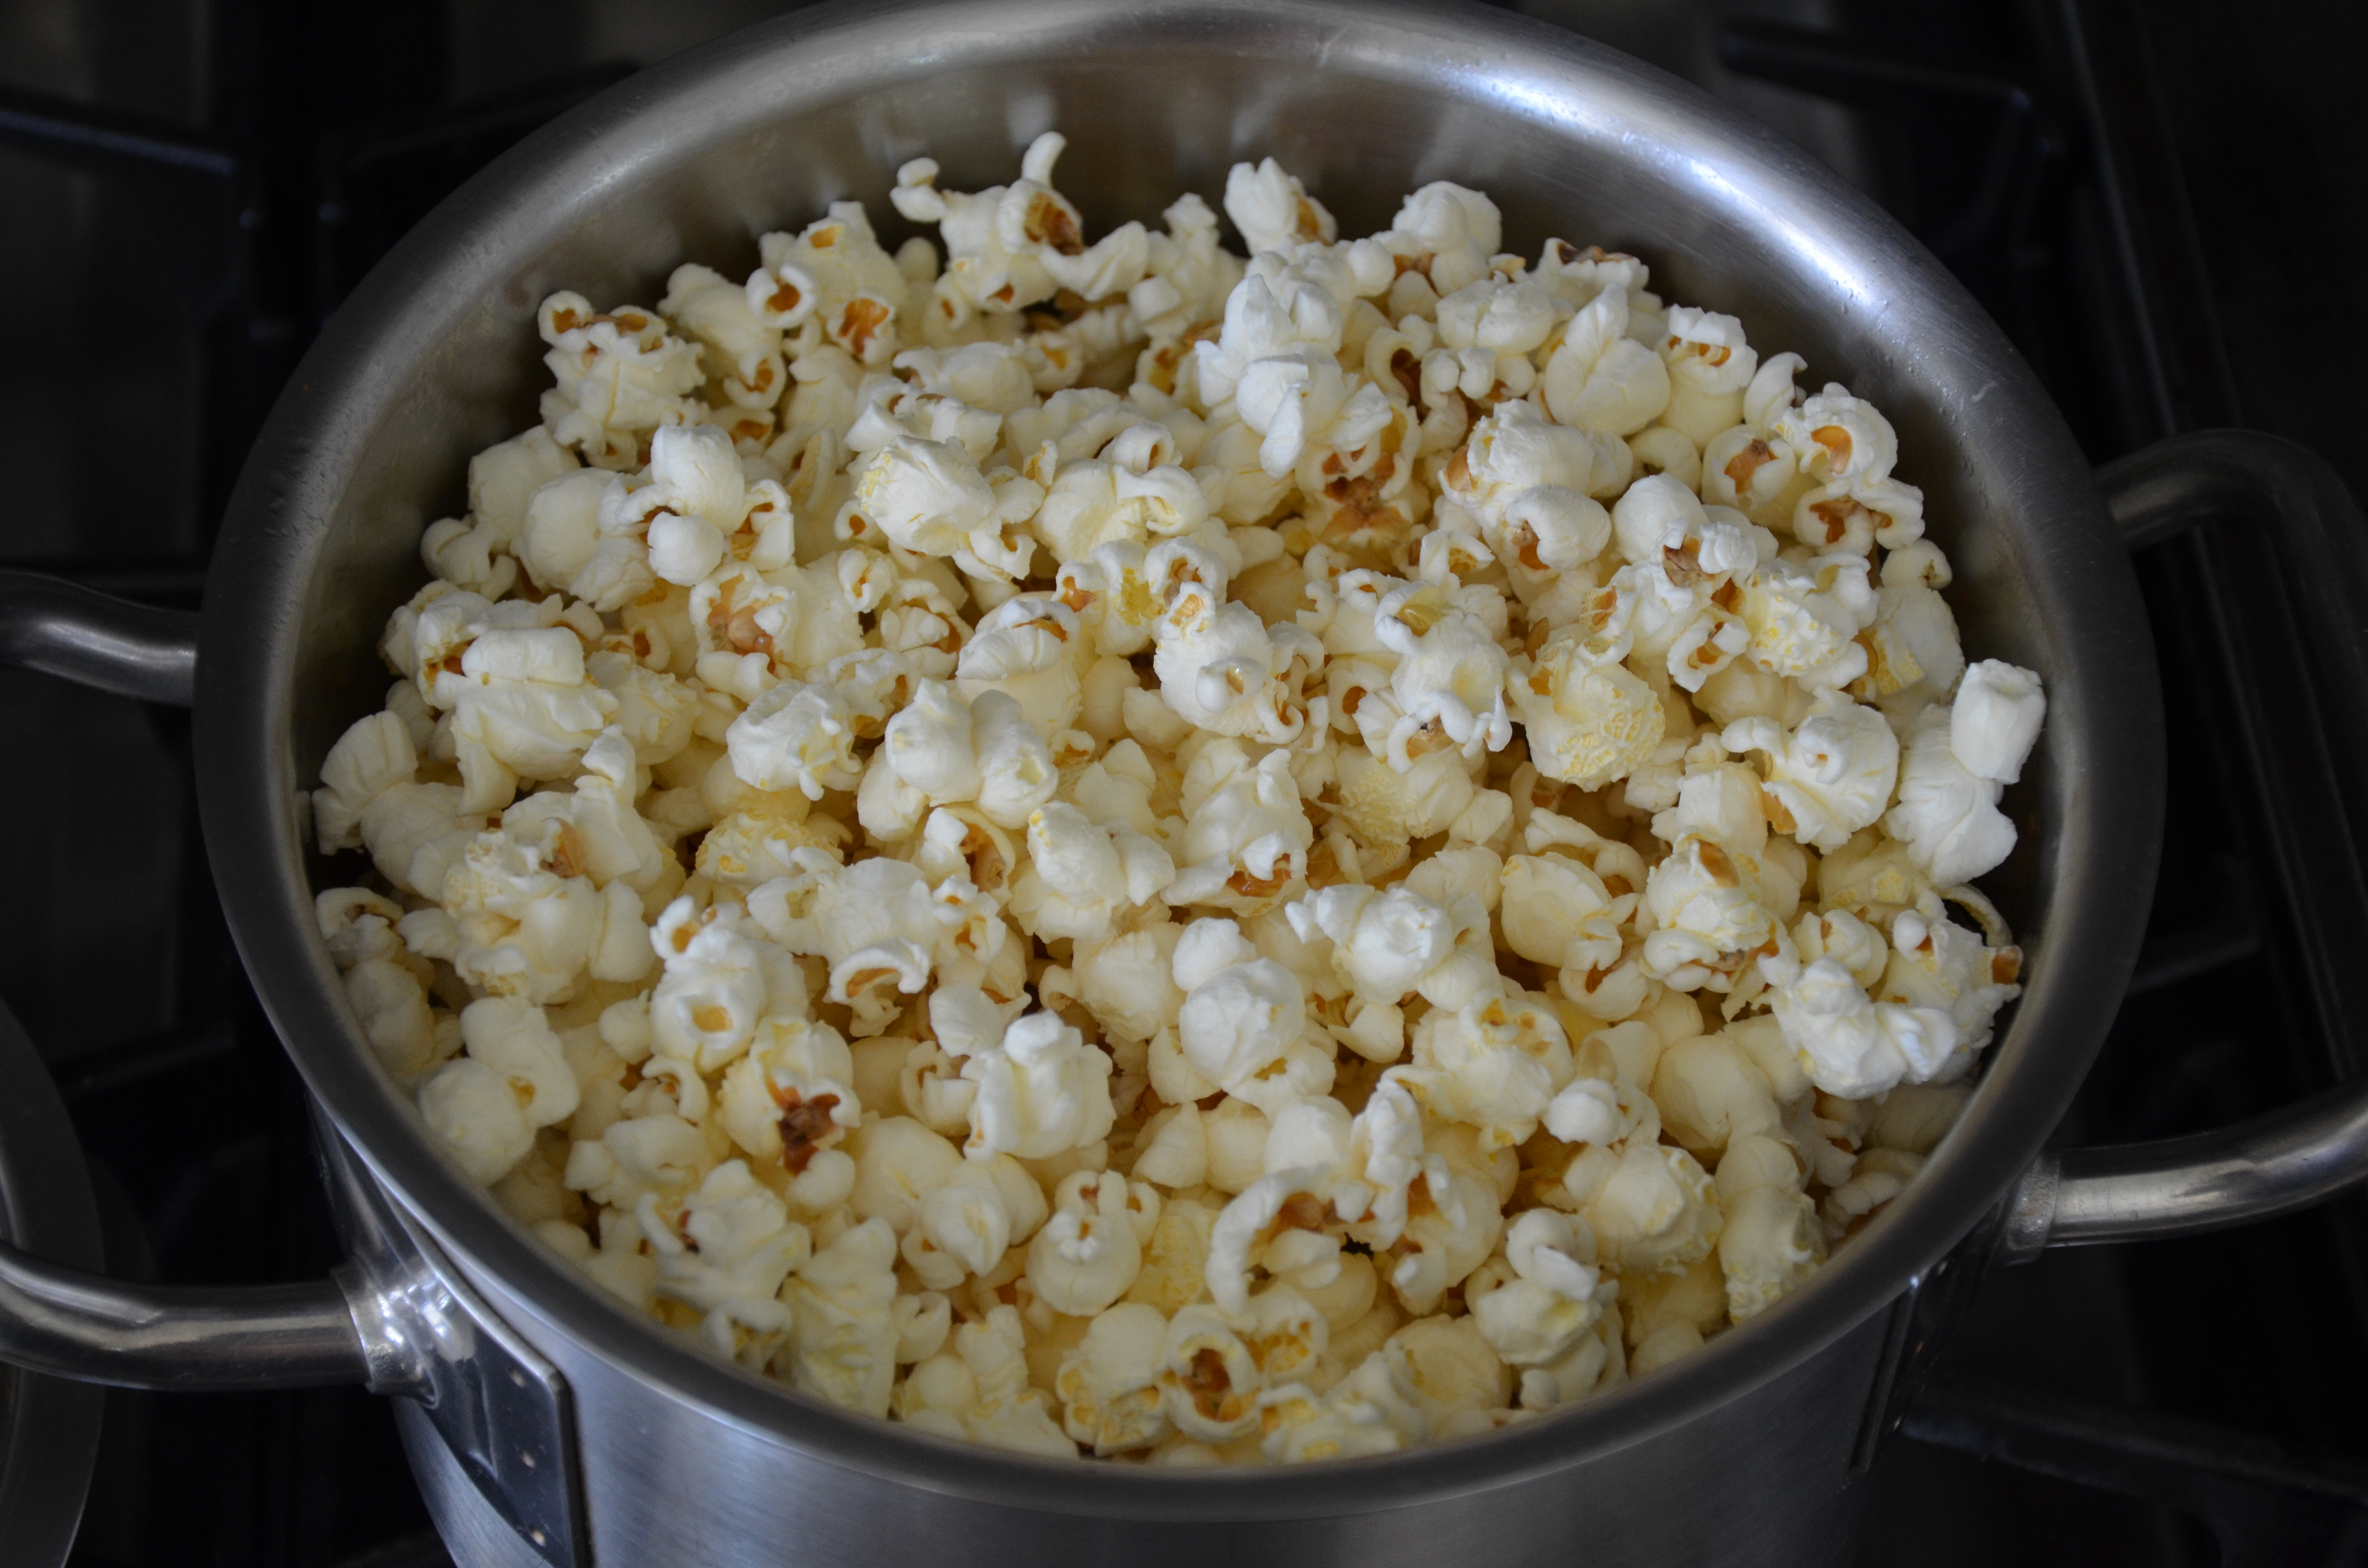 Popcorn Not Microwave